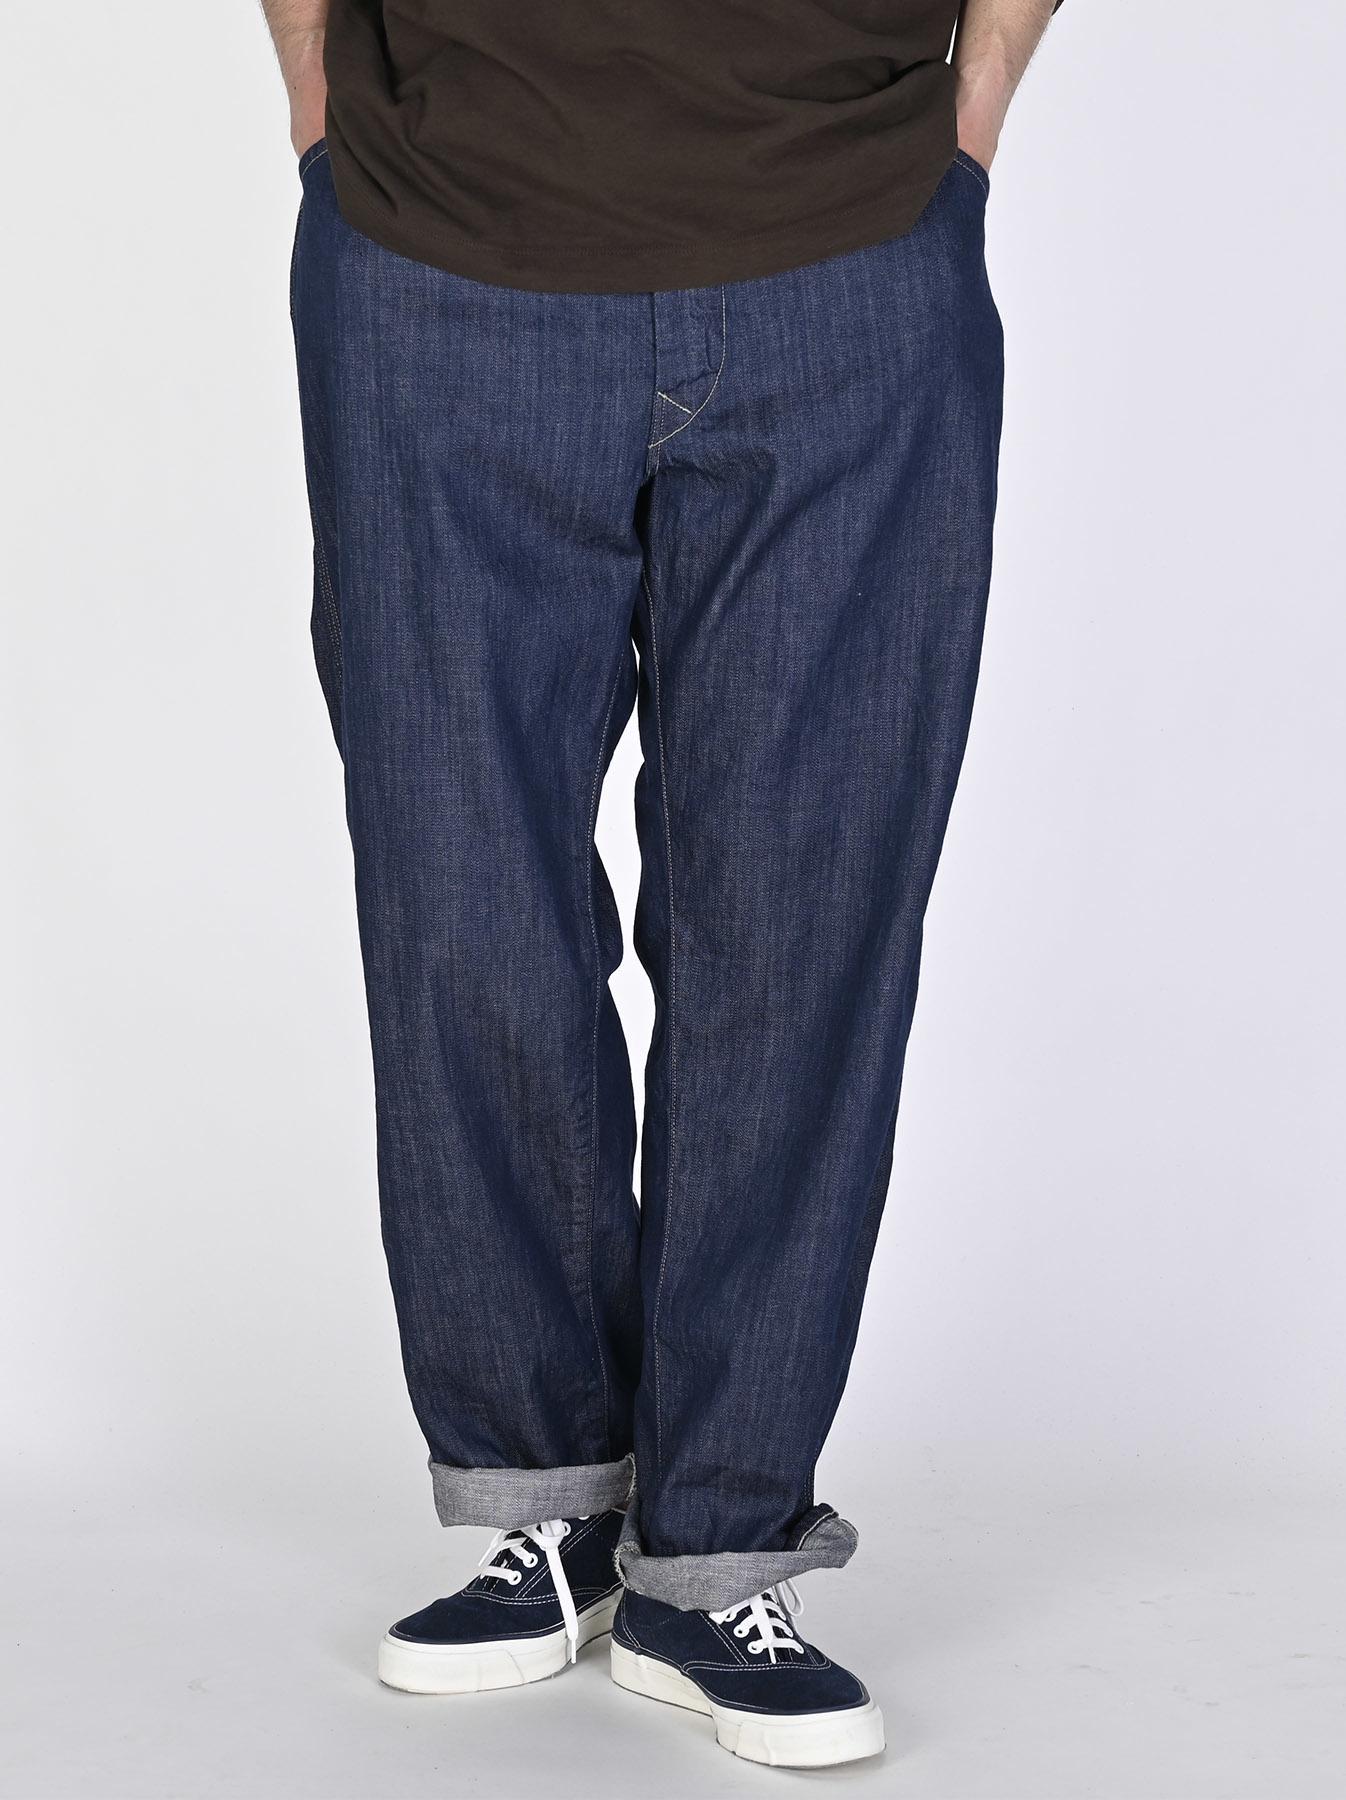 Indigo Nou 908 Painter Pants (0721)-2